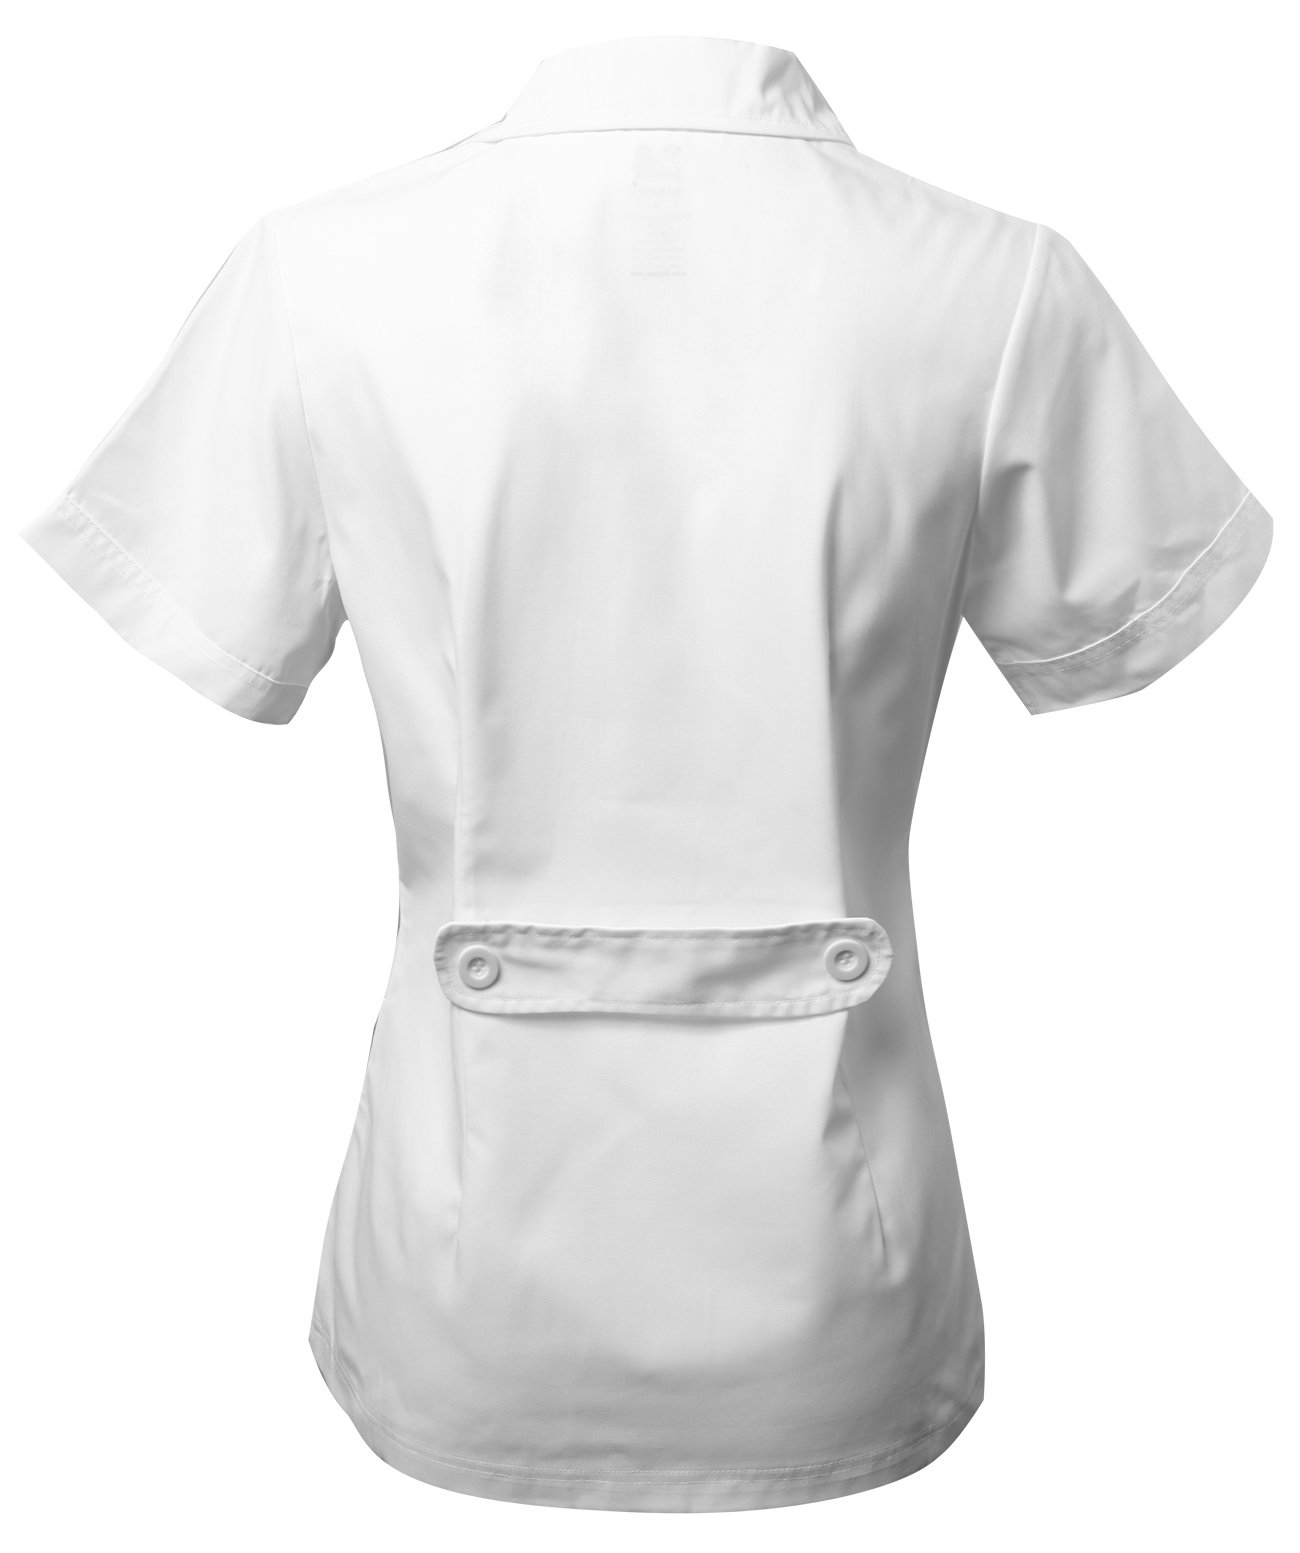 Dagacci Scrubs Medical Uniform Women's Chest Comfortable Short Sleeve Lab Coat (Small) by Dagacci Medical Uniform (Image #3)